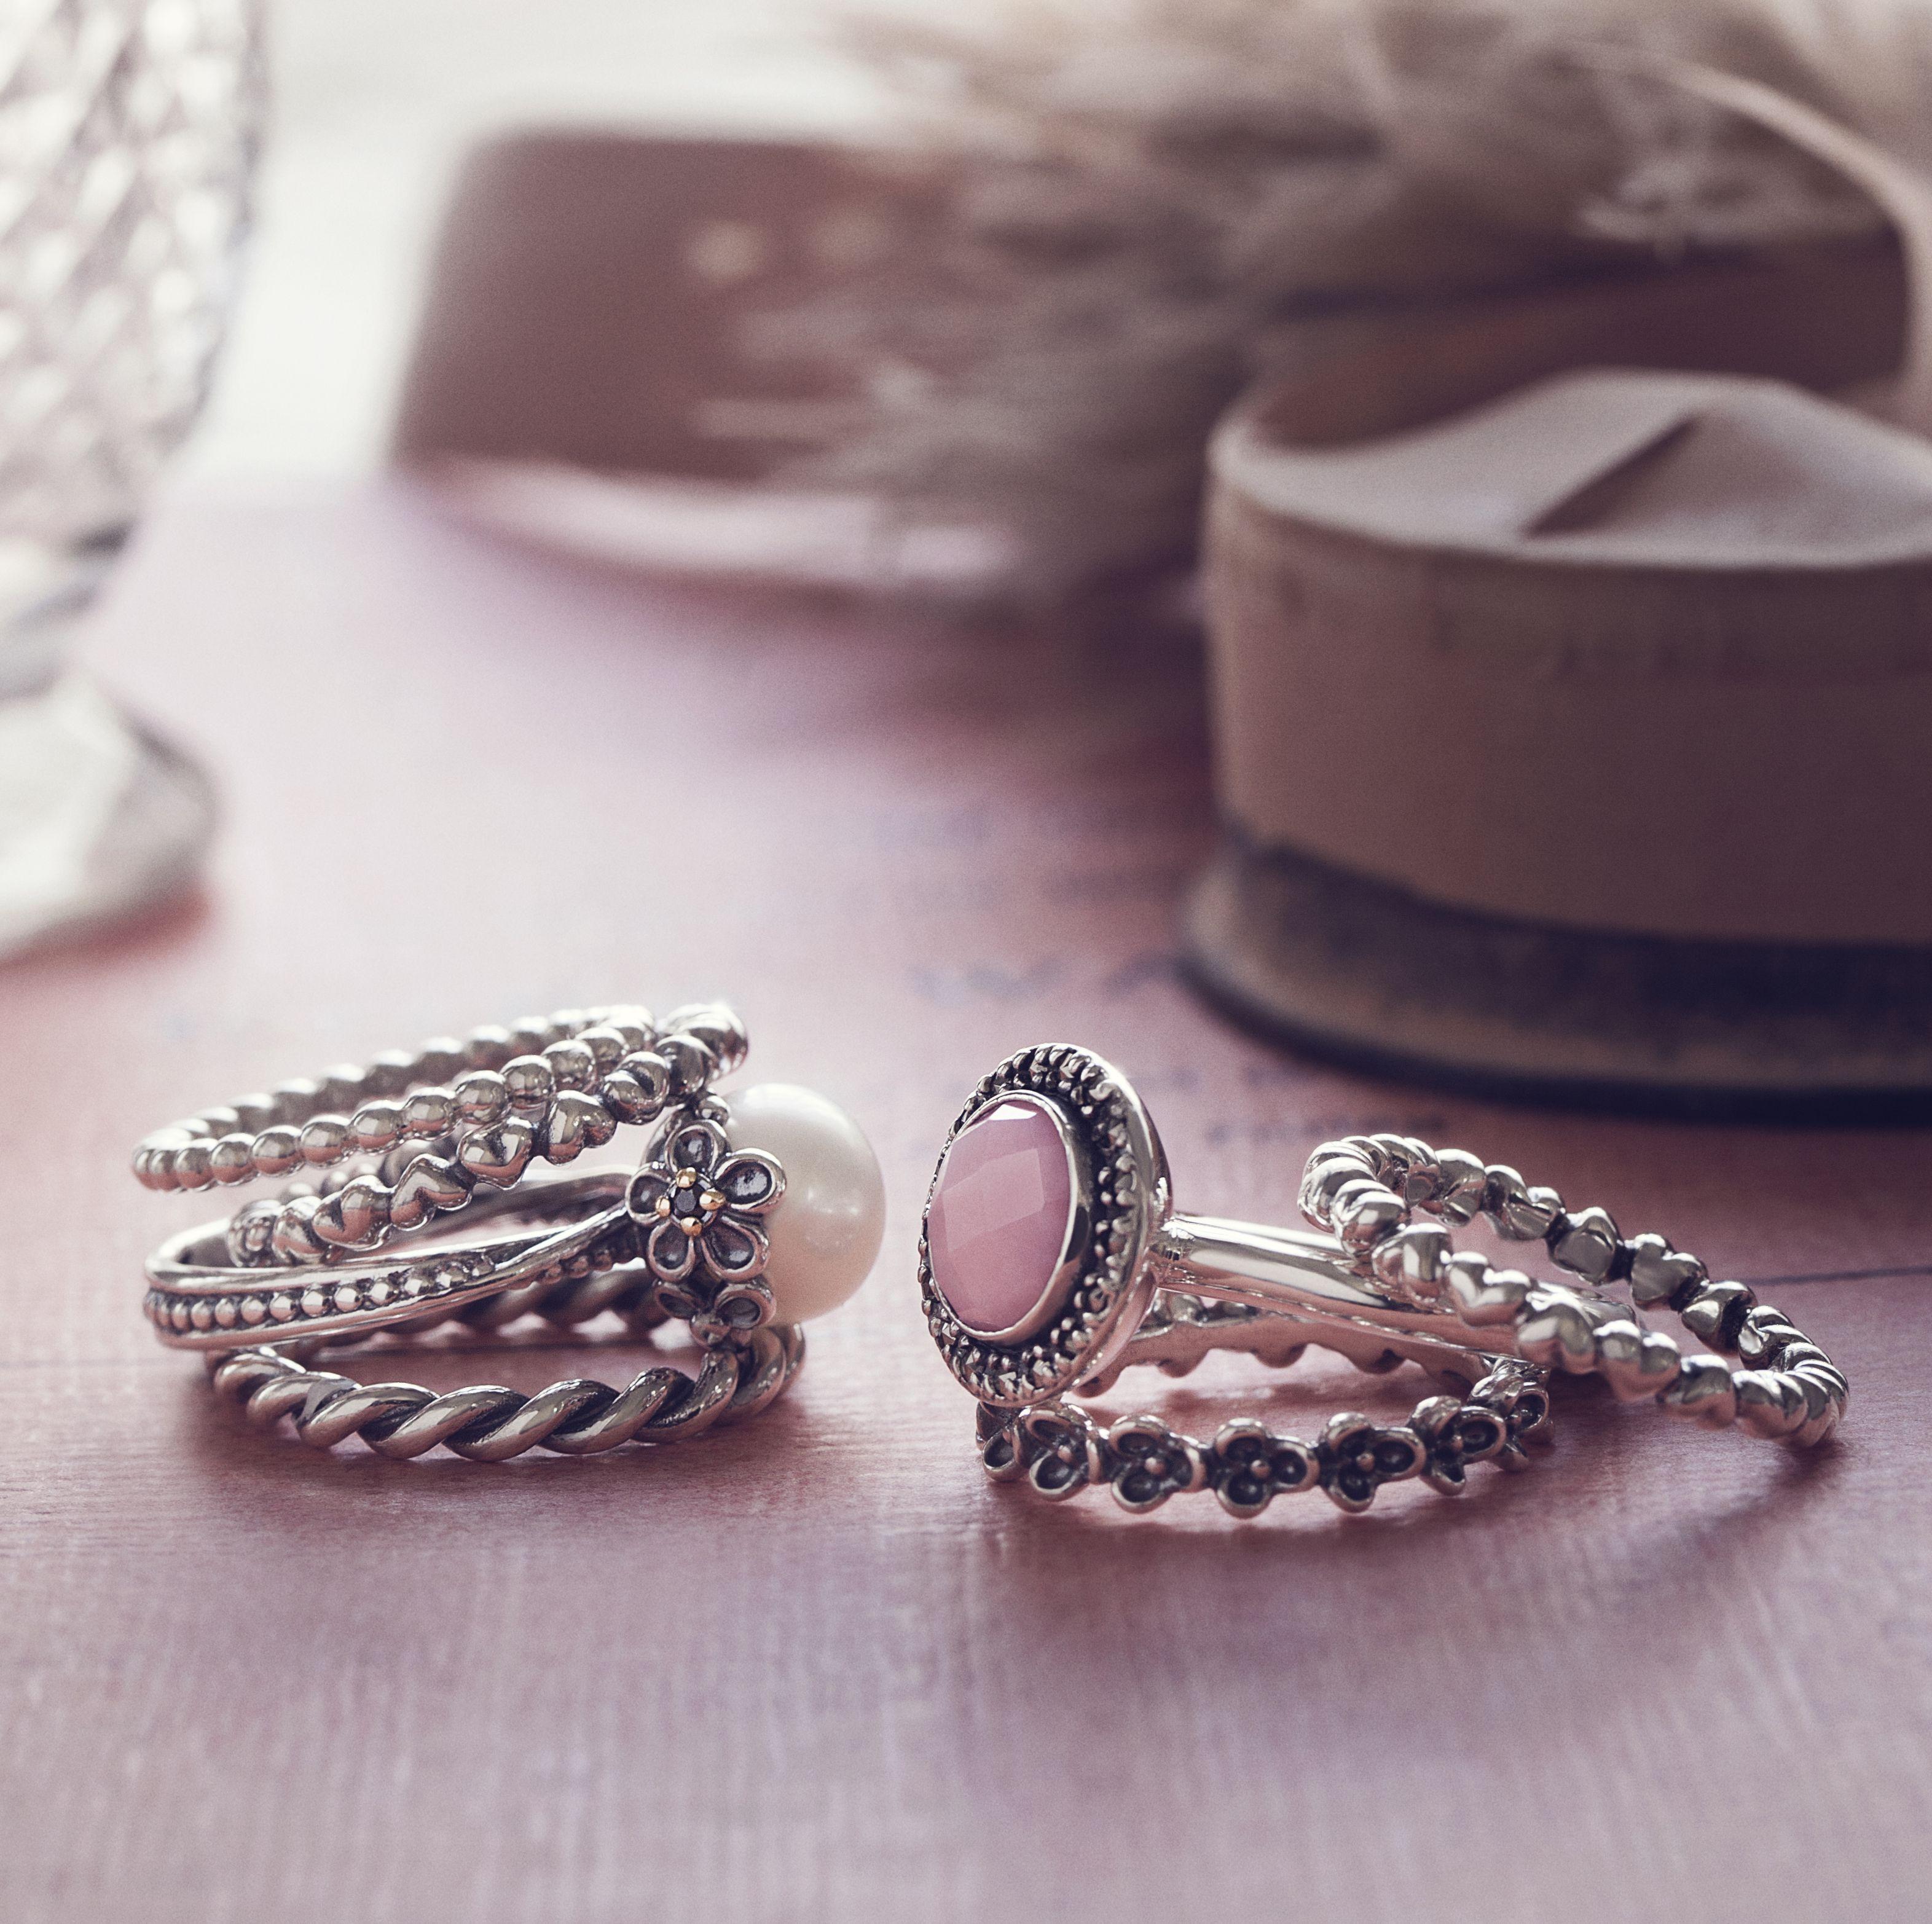 Rings Pandora Jewelry: Stackable Rings. Pandora